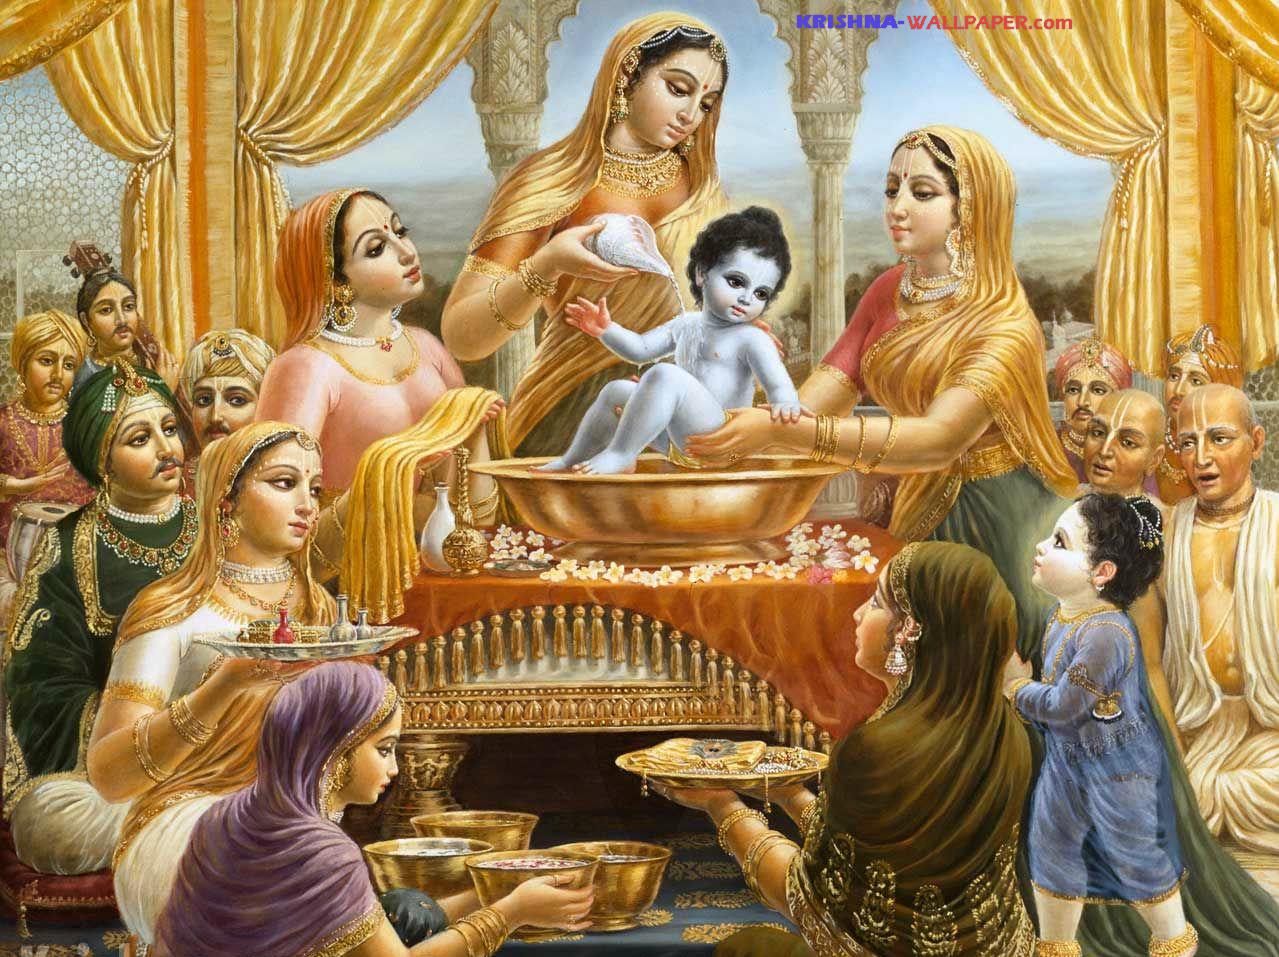 http://1.bp.blogspot.com/-MY1xYuiYX70/TkGLxSYKNFI/AAAAAAAAABs/xncKPahJOy4/s1600/lord-krishna-is-born-janmashtami.jpg